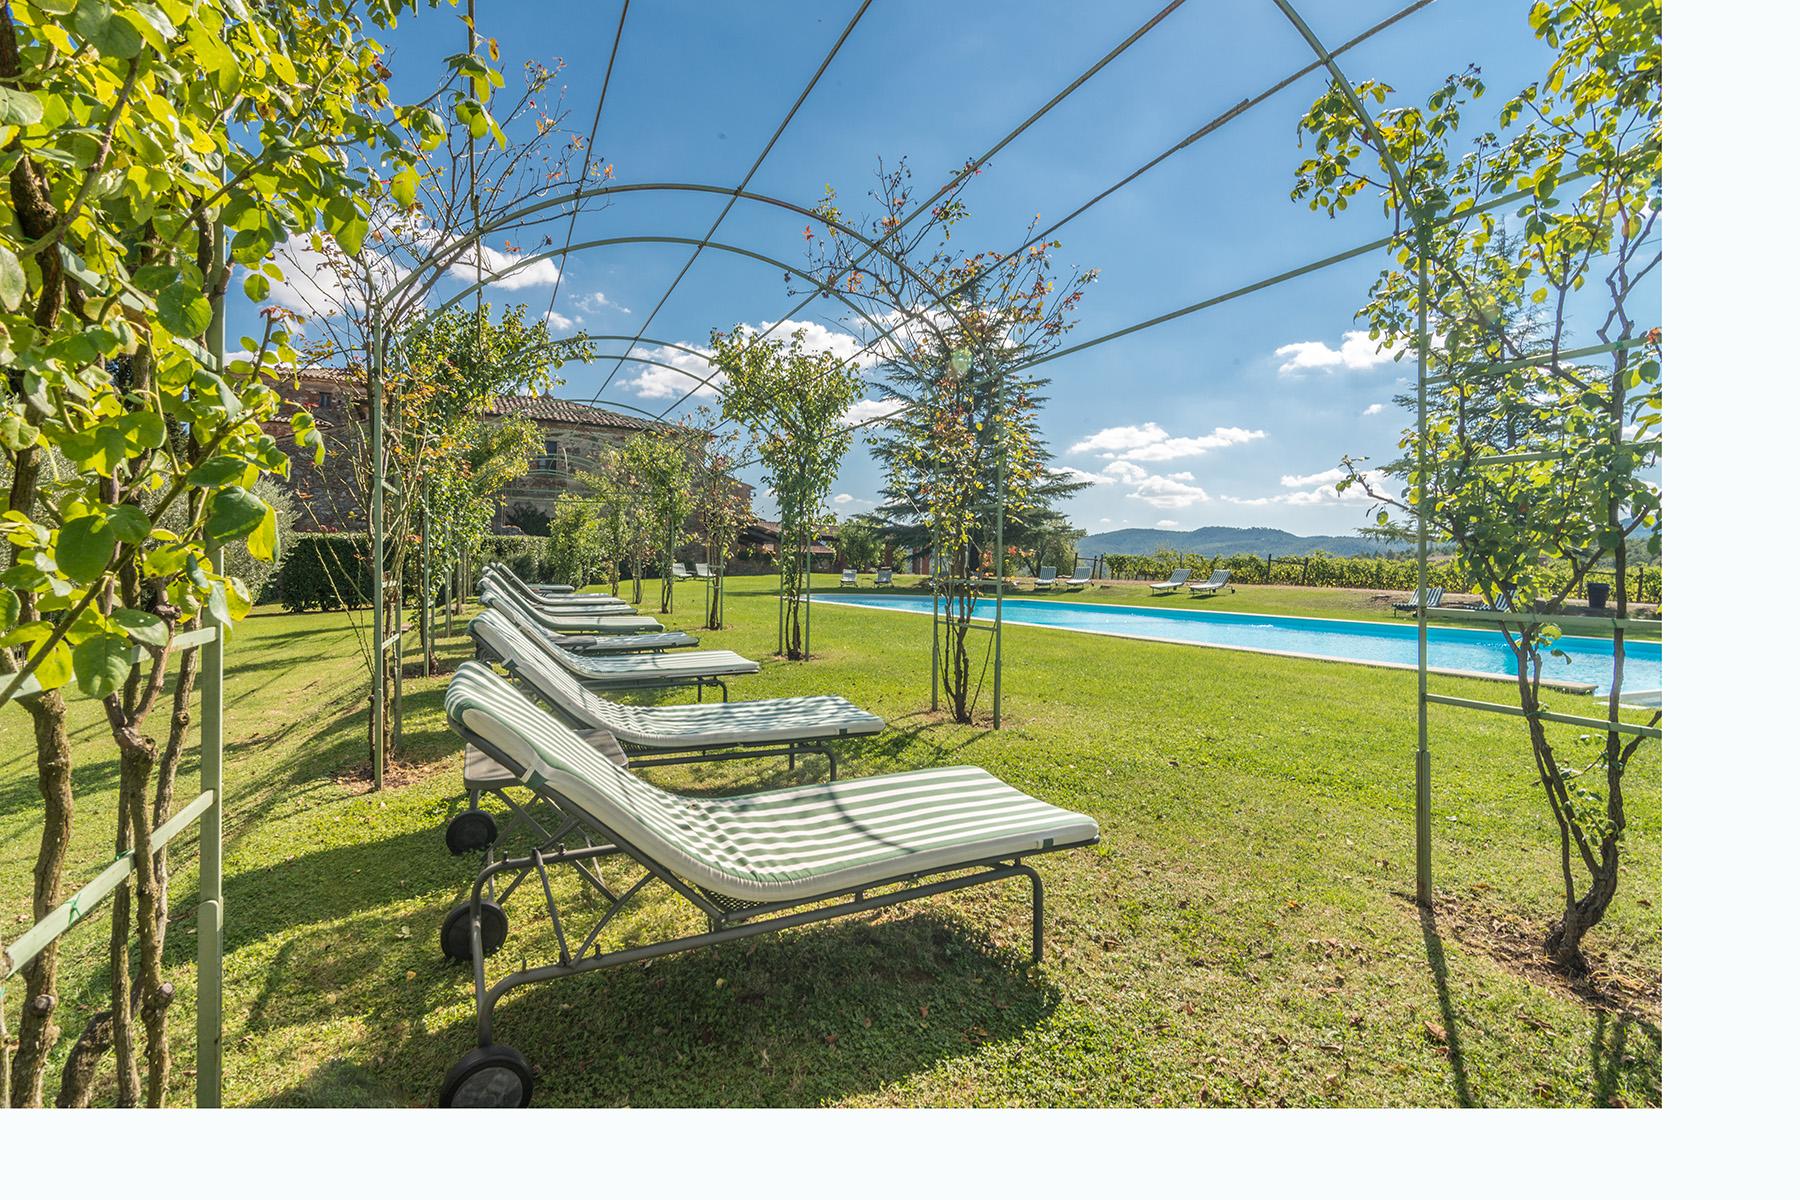 Additional photo for property listing at Amazing Boutique Hotel near Siena Sinalunga Sinalunga, Siena 53100 Italy